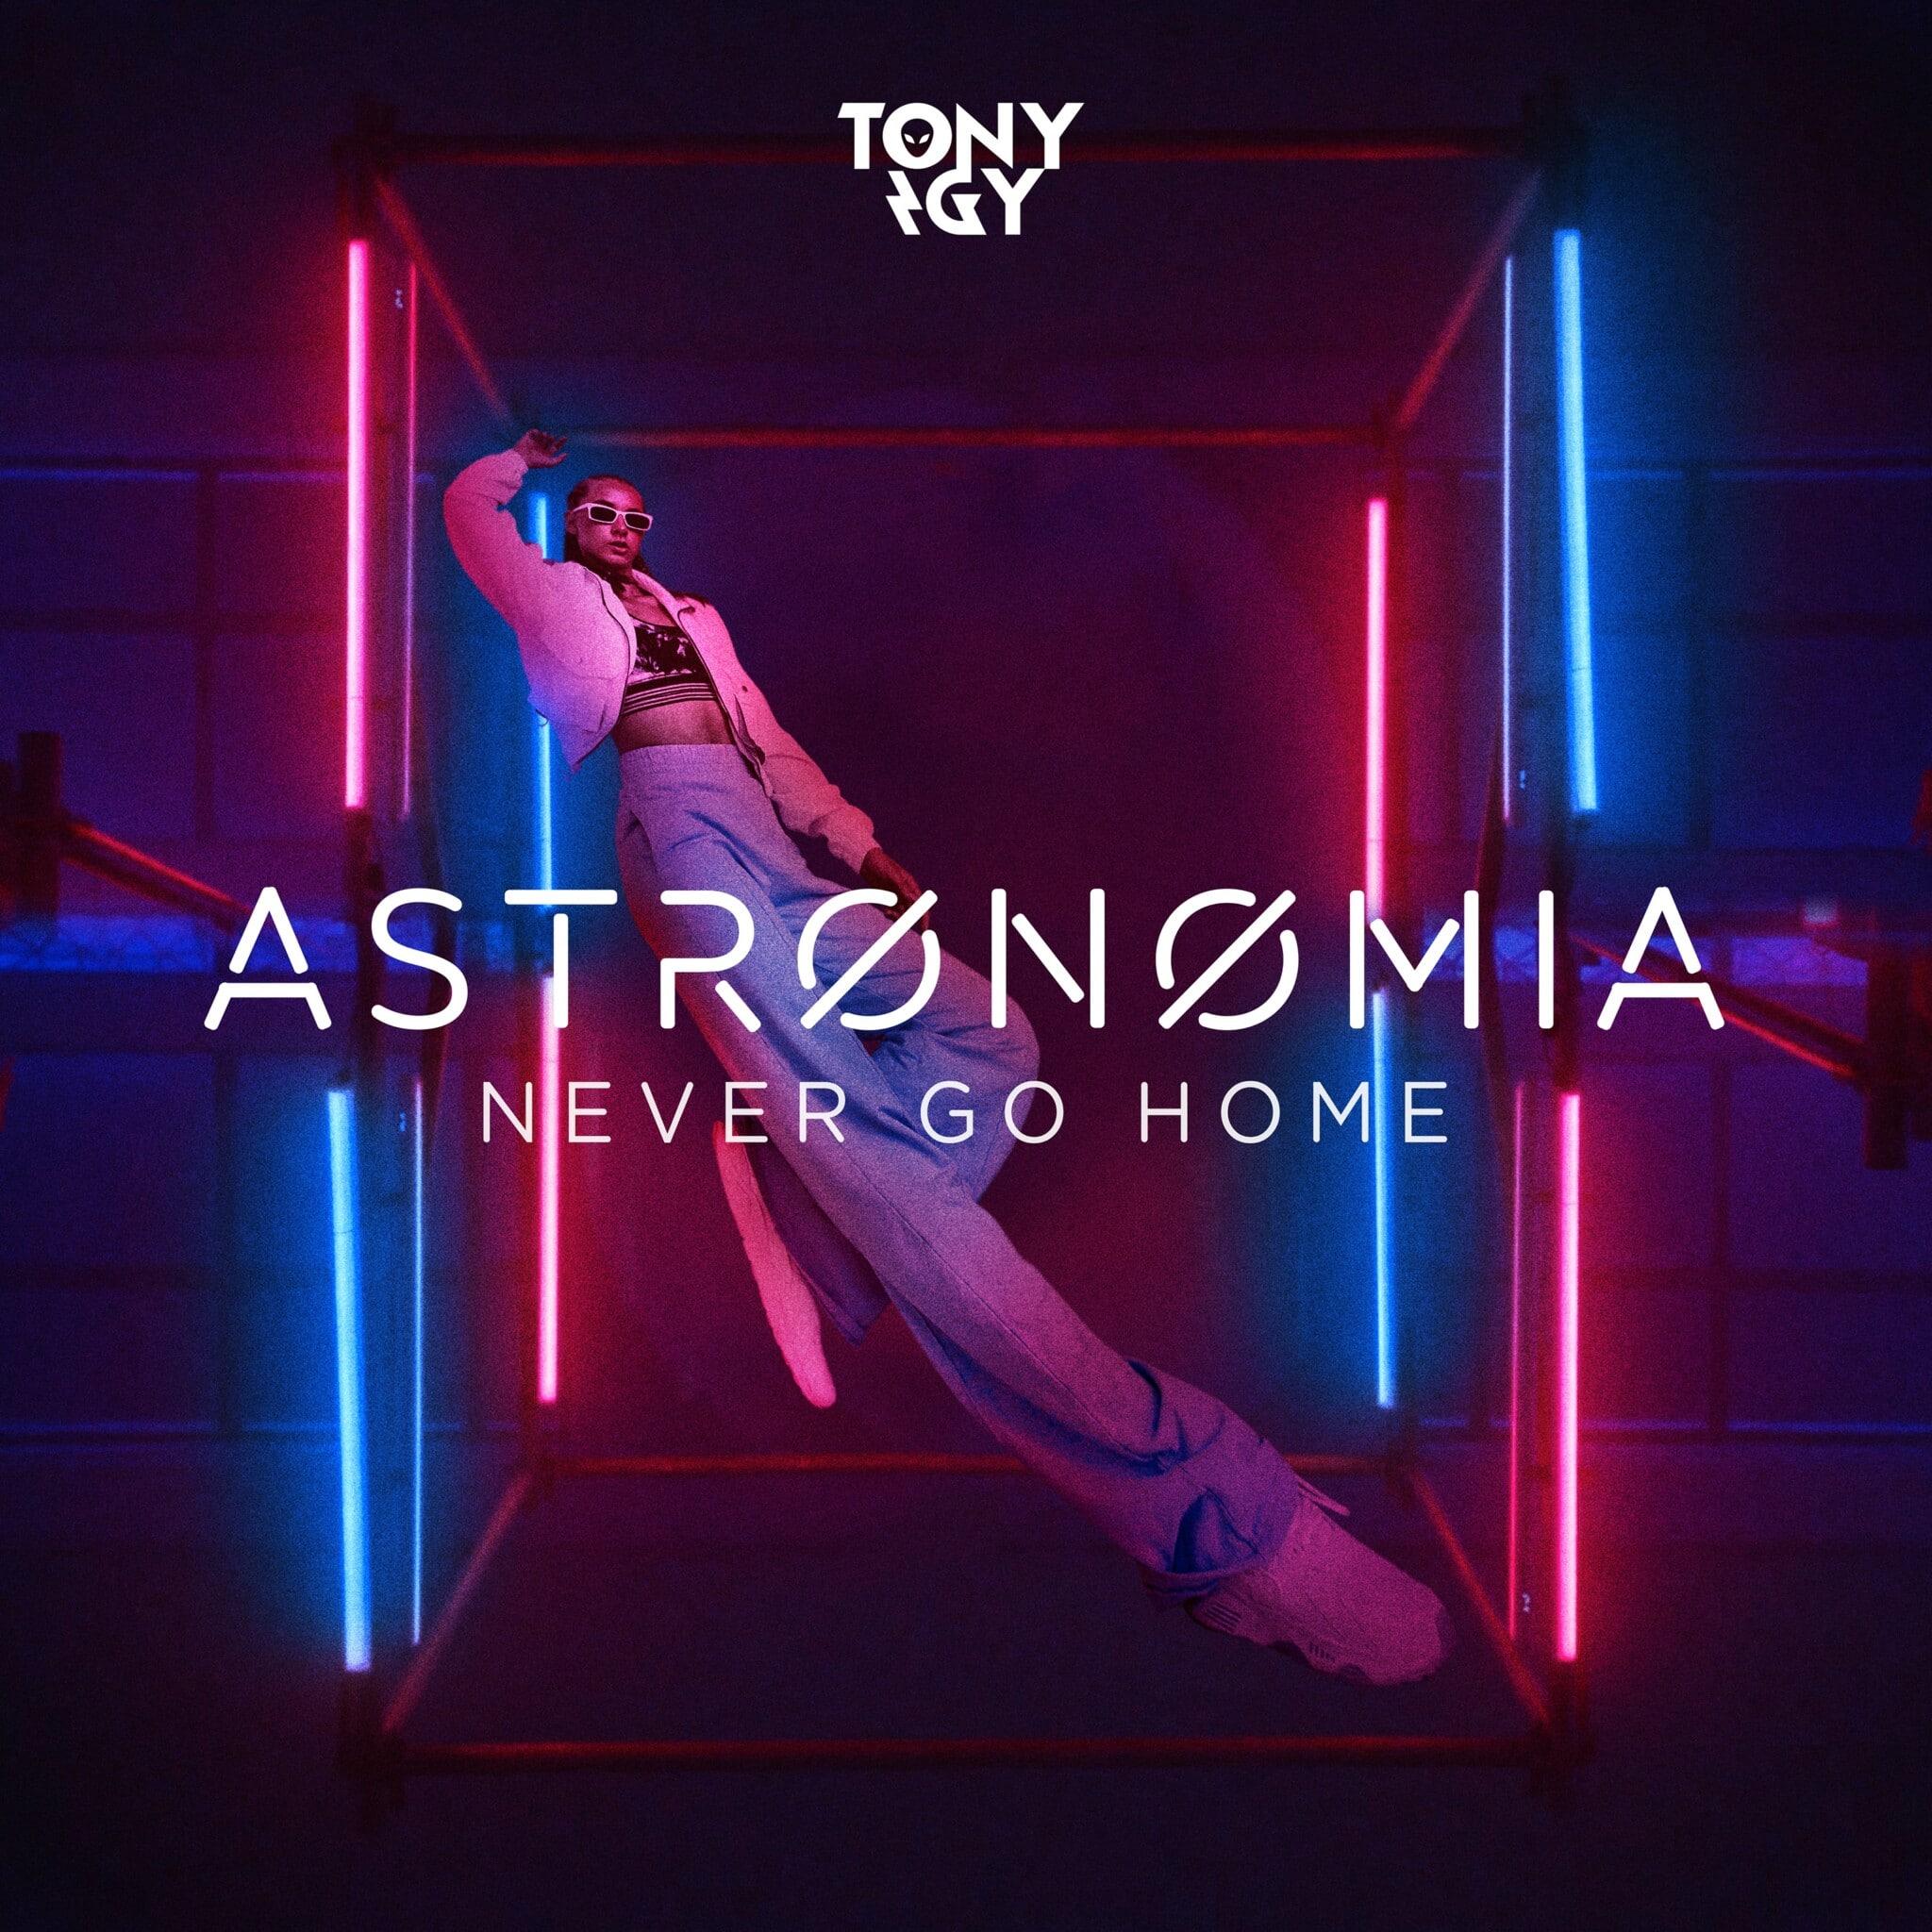 Astronomia Never Go Home Tony Igy